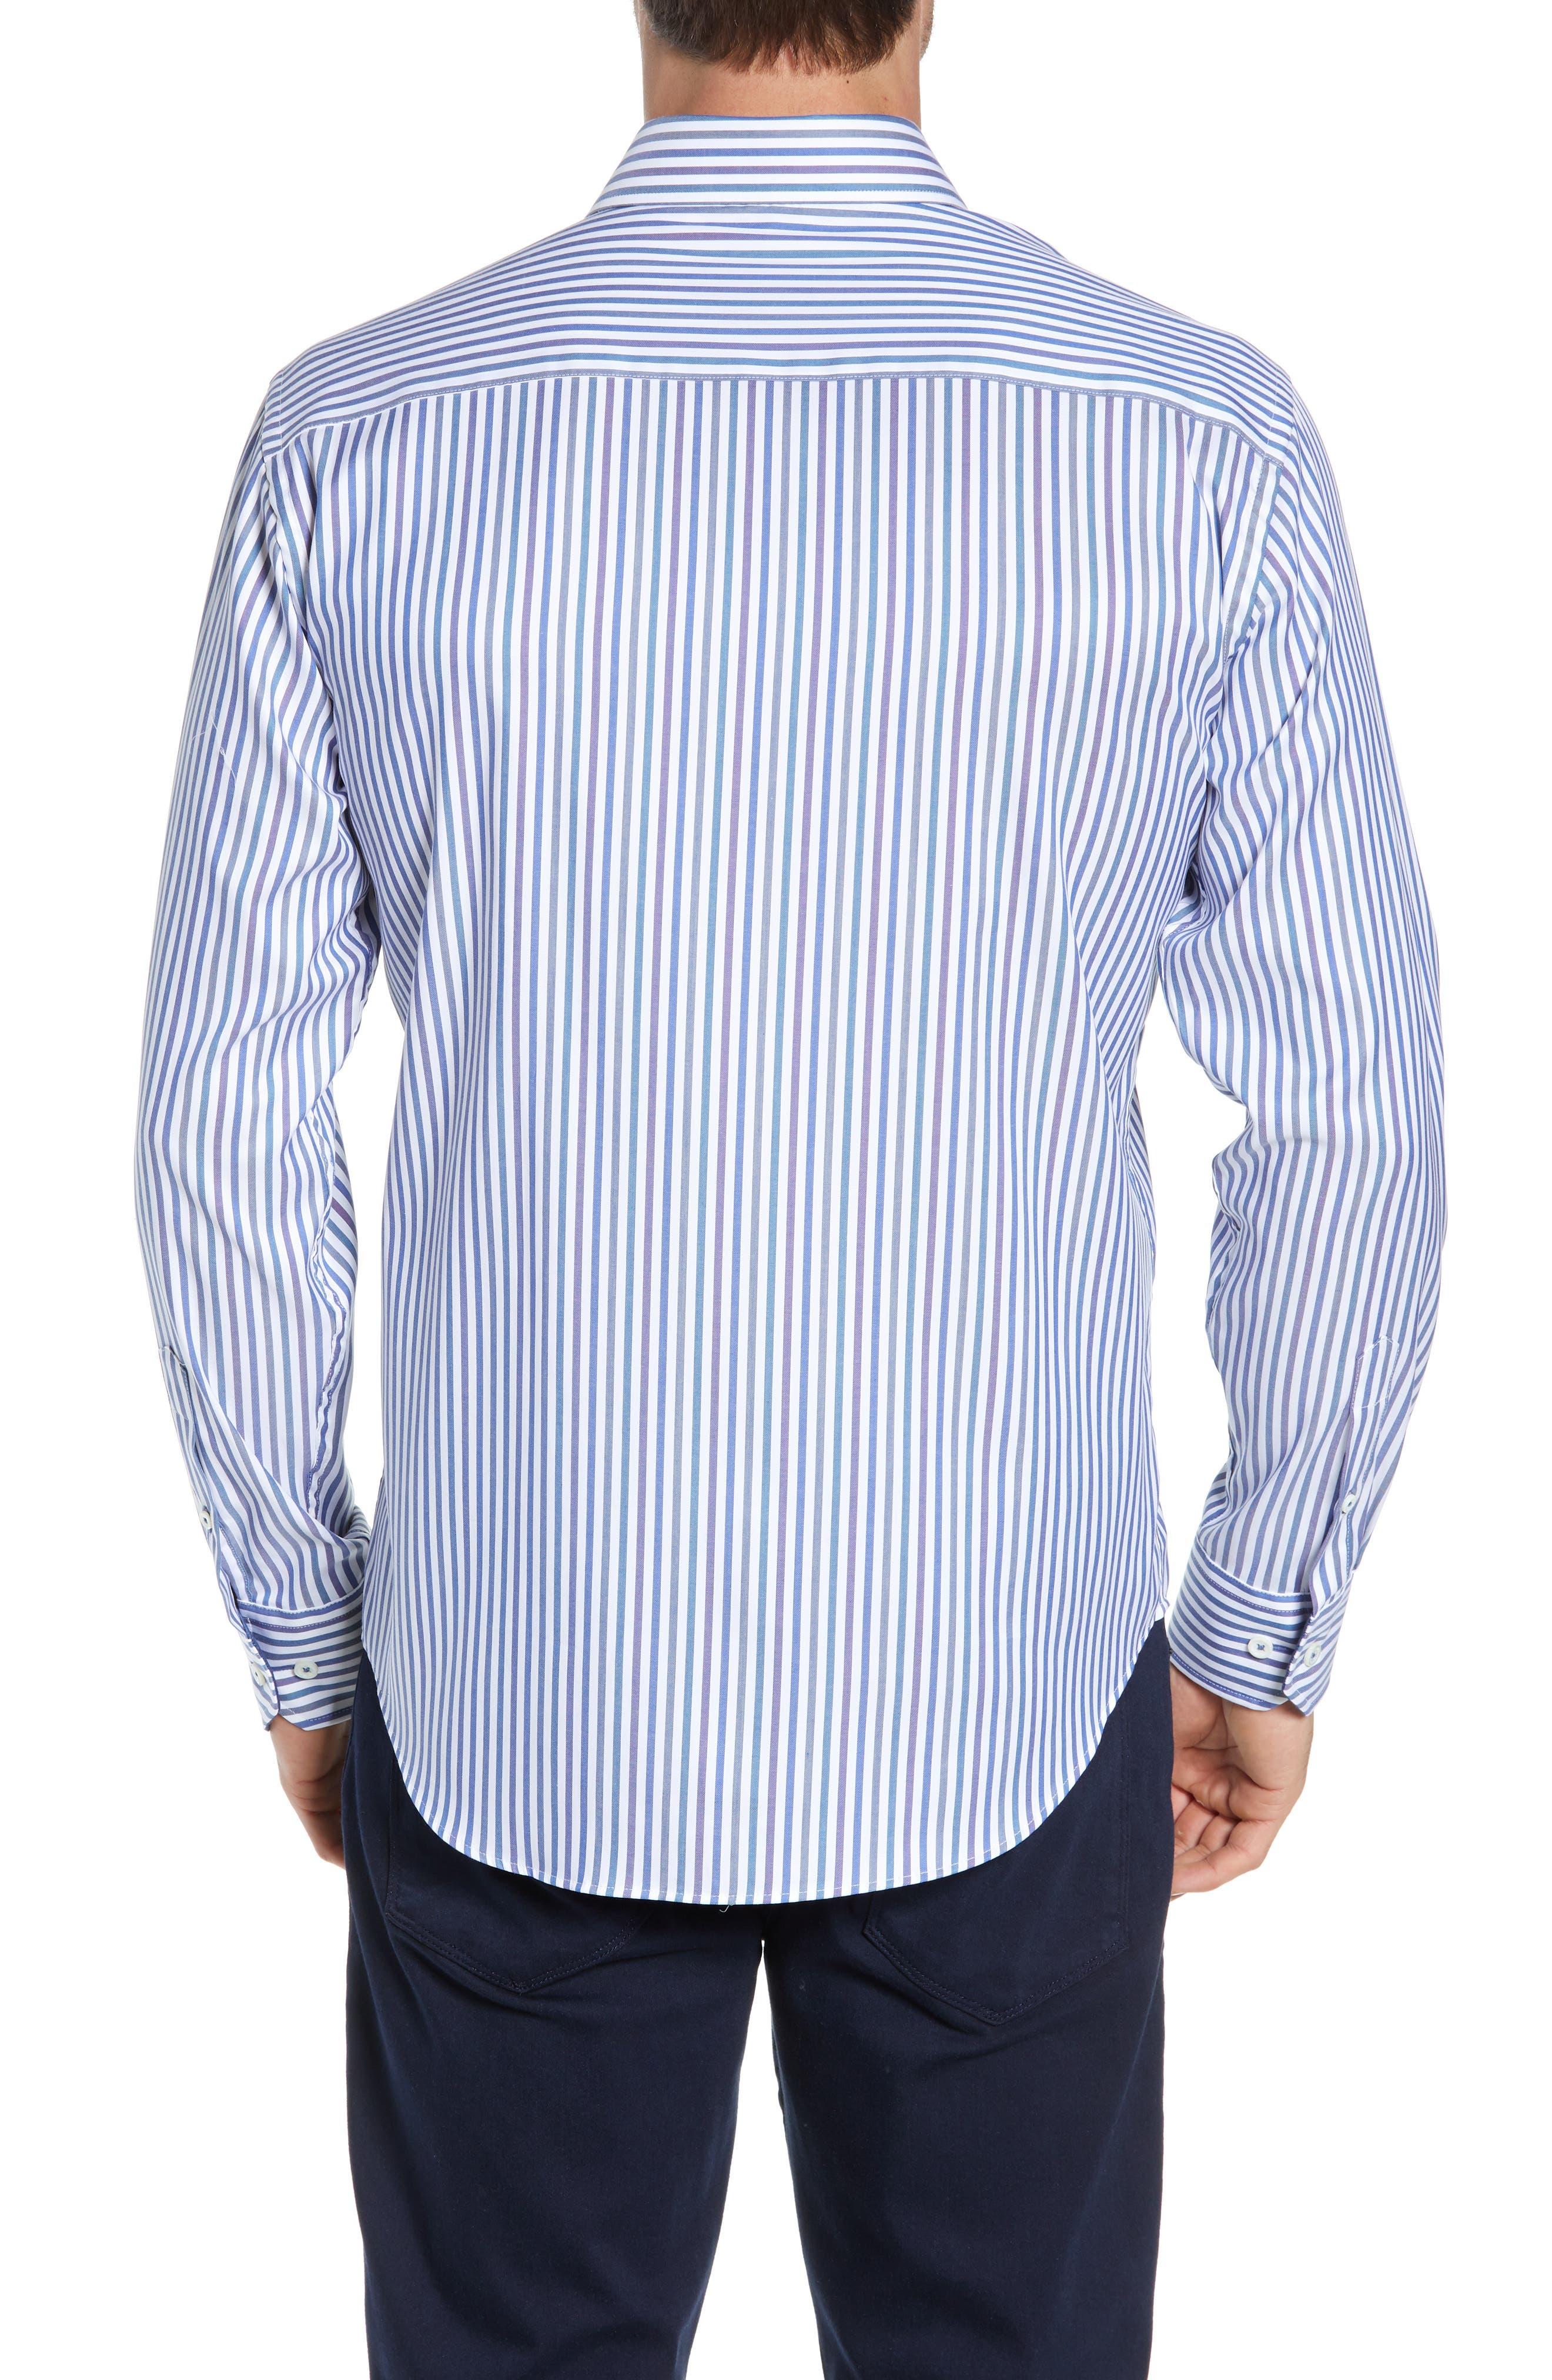 BUGATCHI, Classic Fit Stripe Sport Shirt, Alternate thumbnail 3, color, CHALK